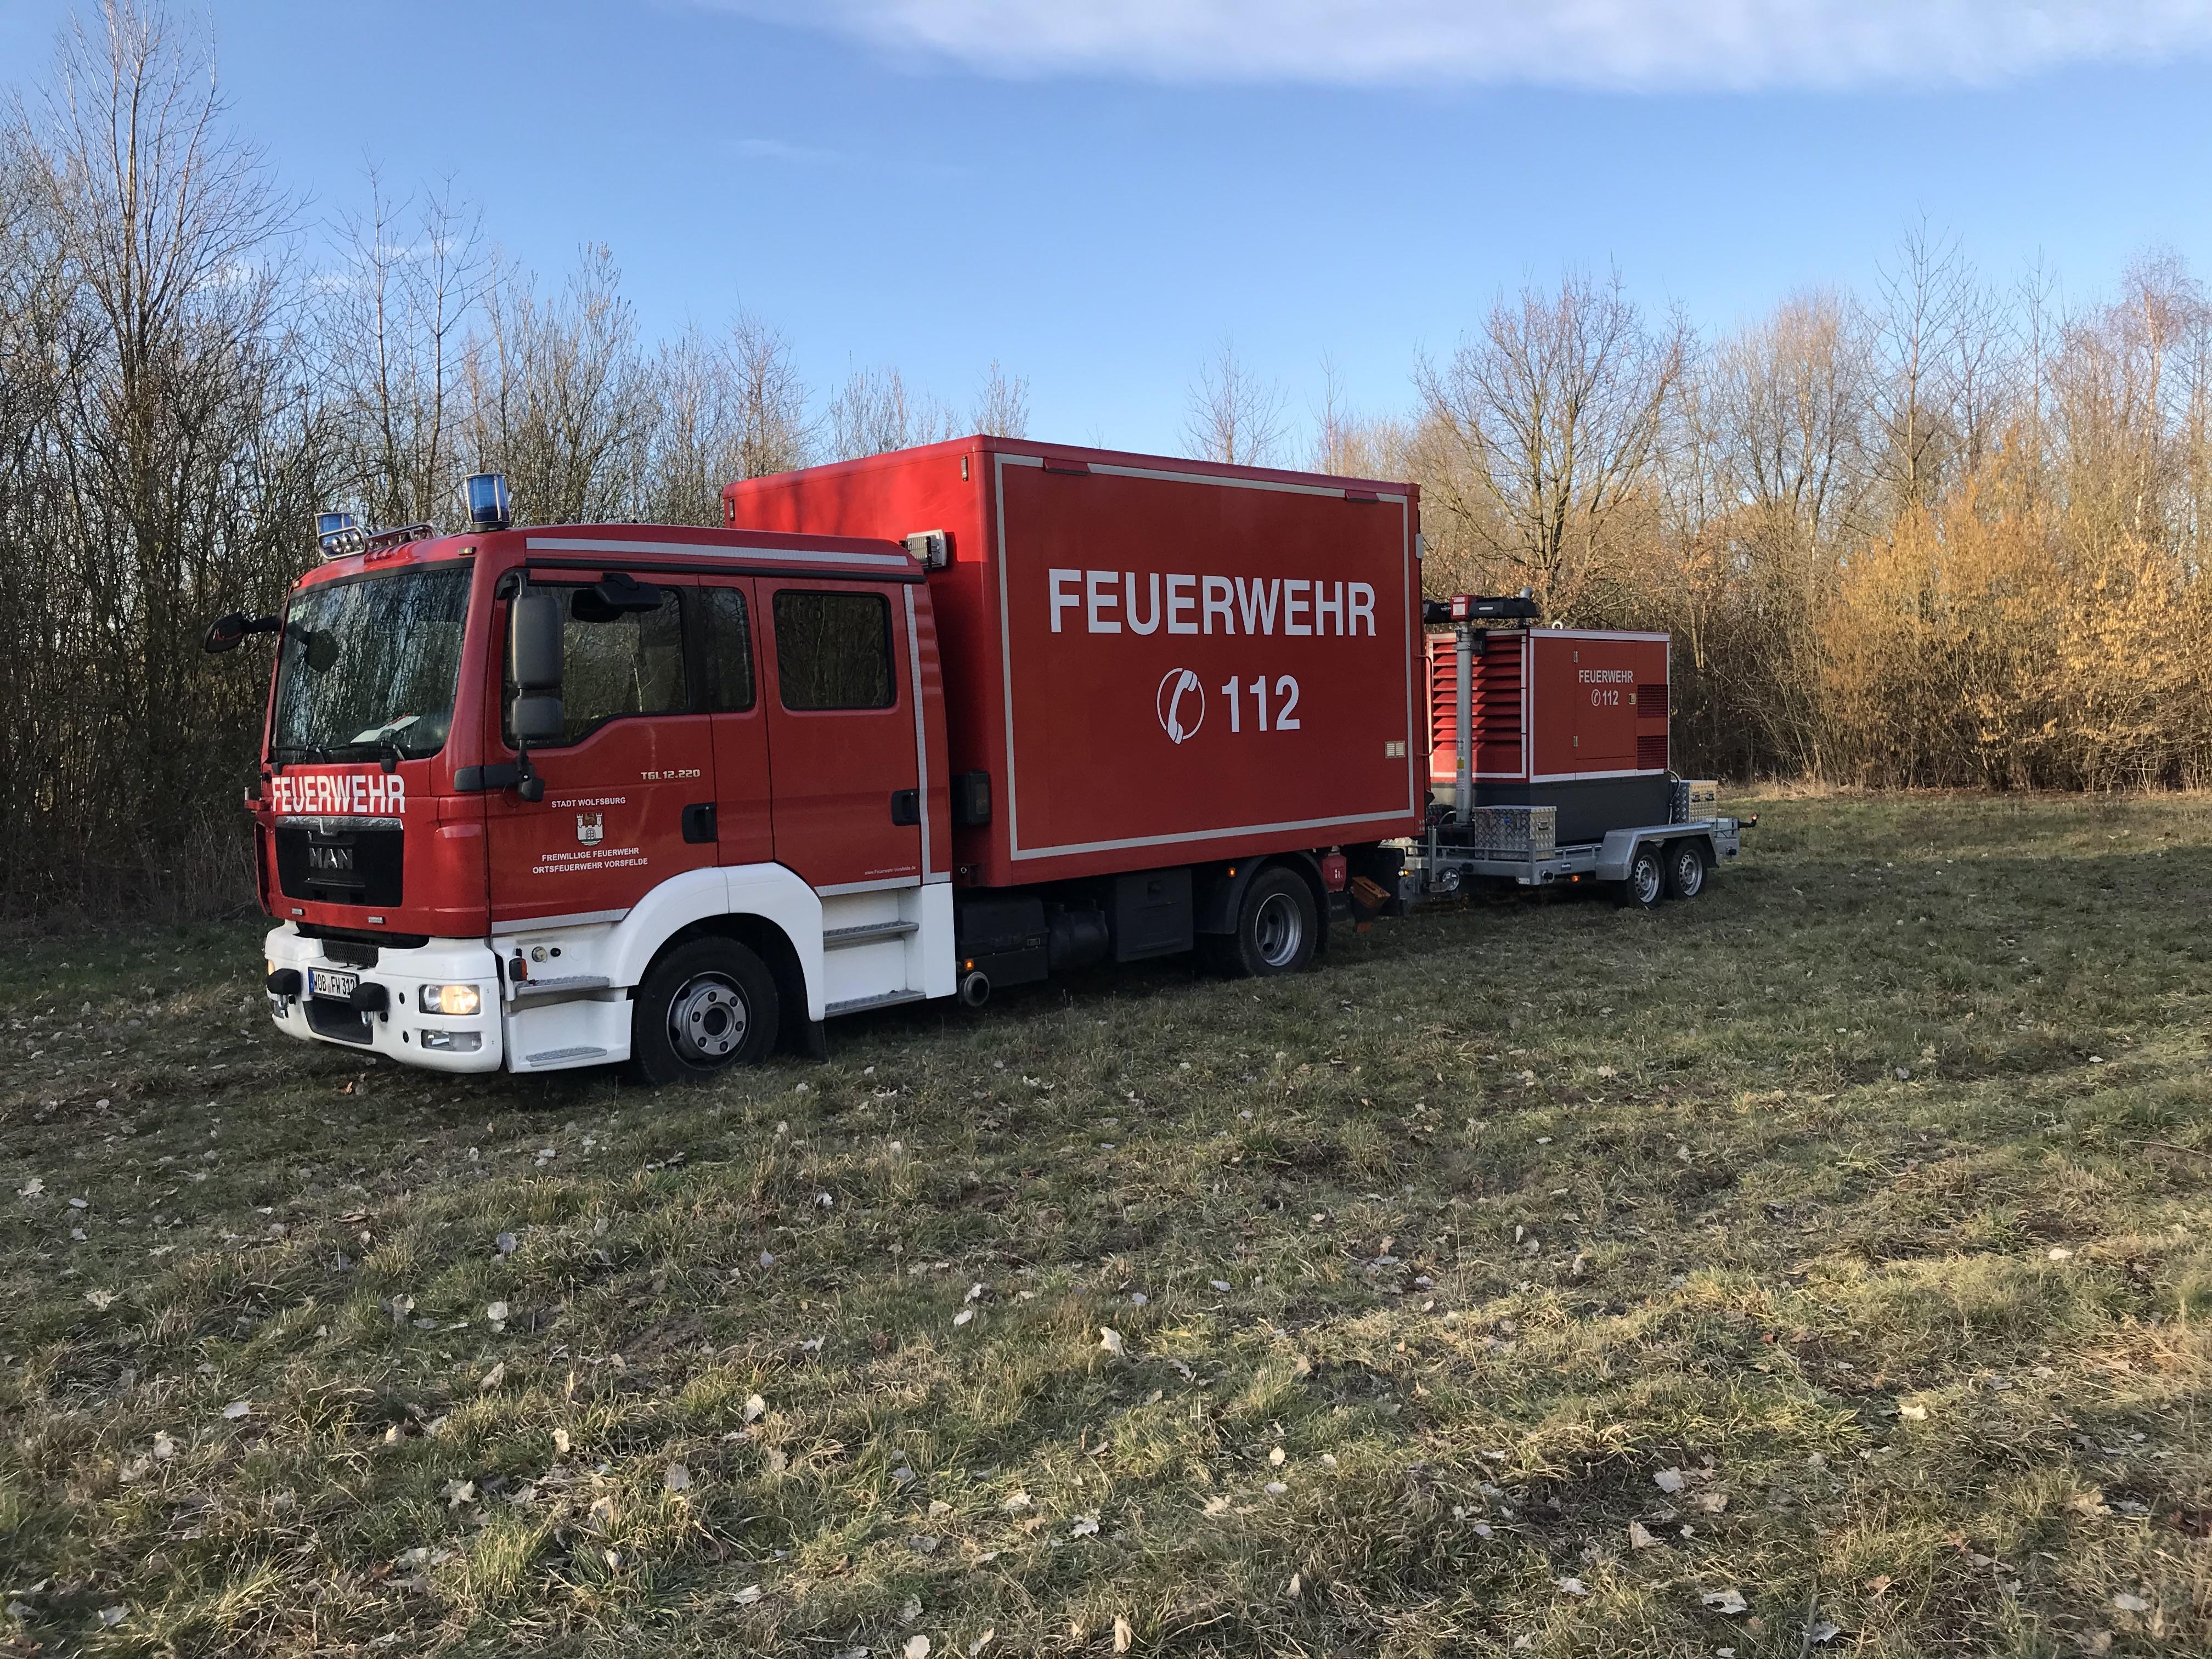 GW-L – Freiwillige Feuerwehr Vorsfelde